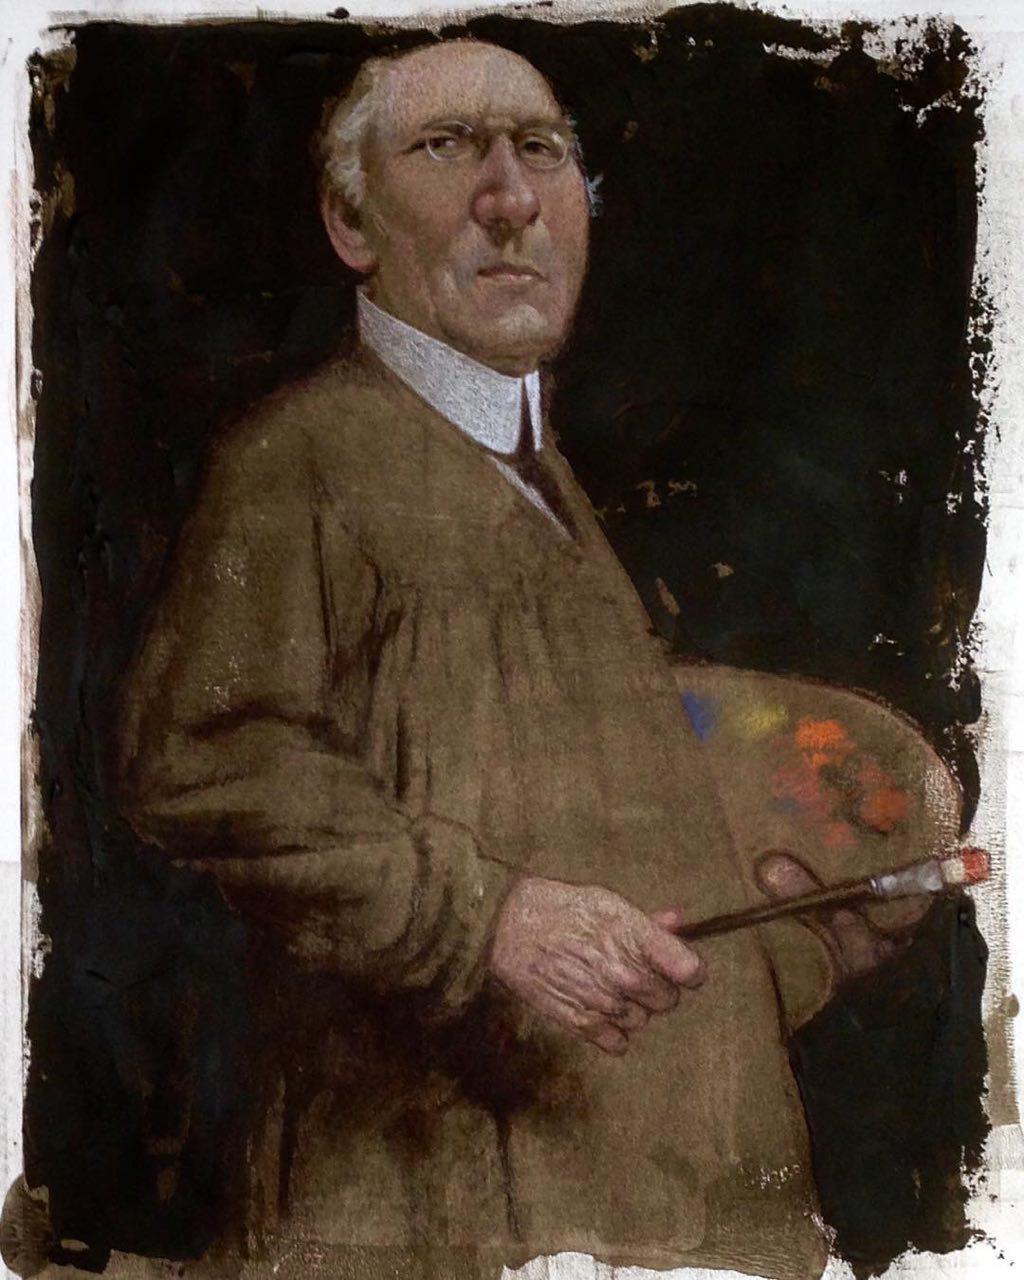 C.F. Payne: An American Illustrator